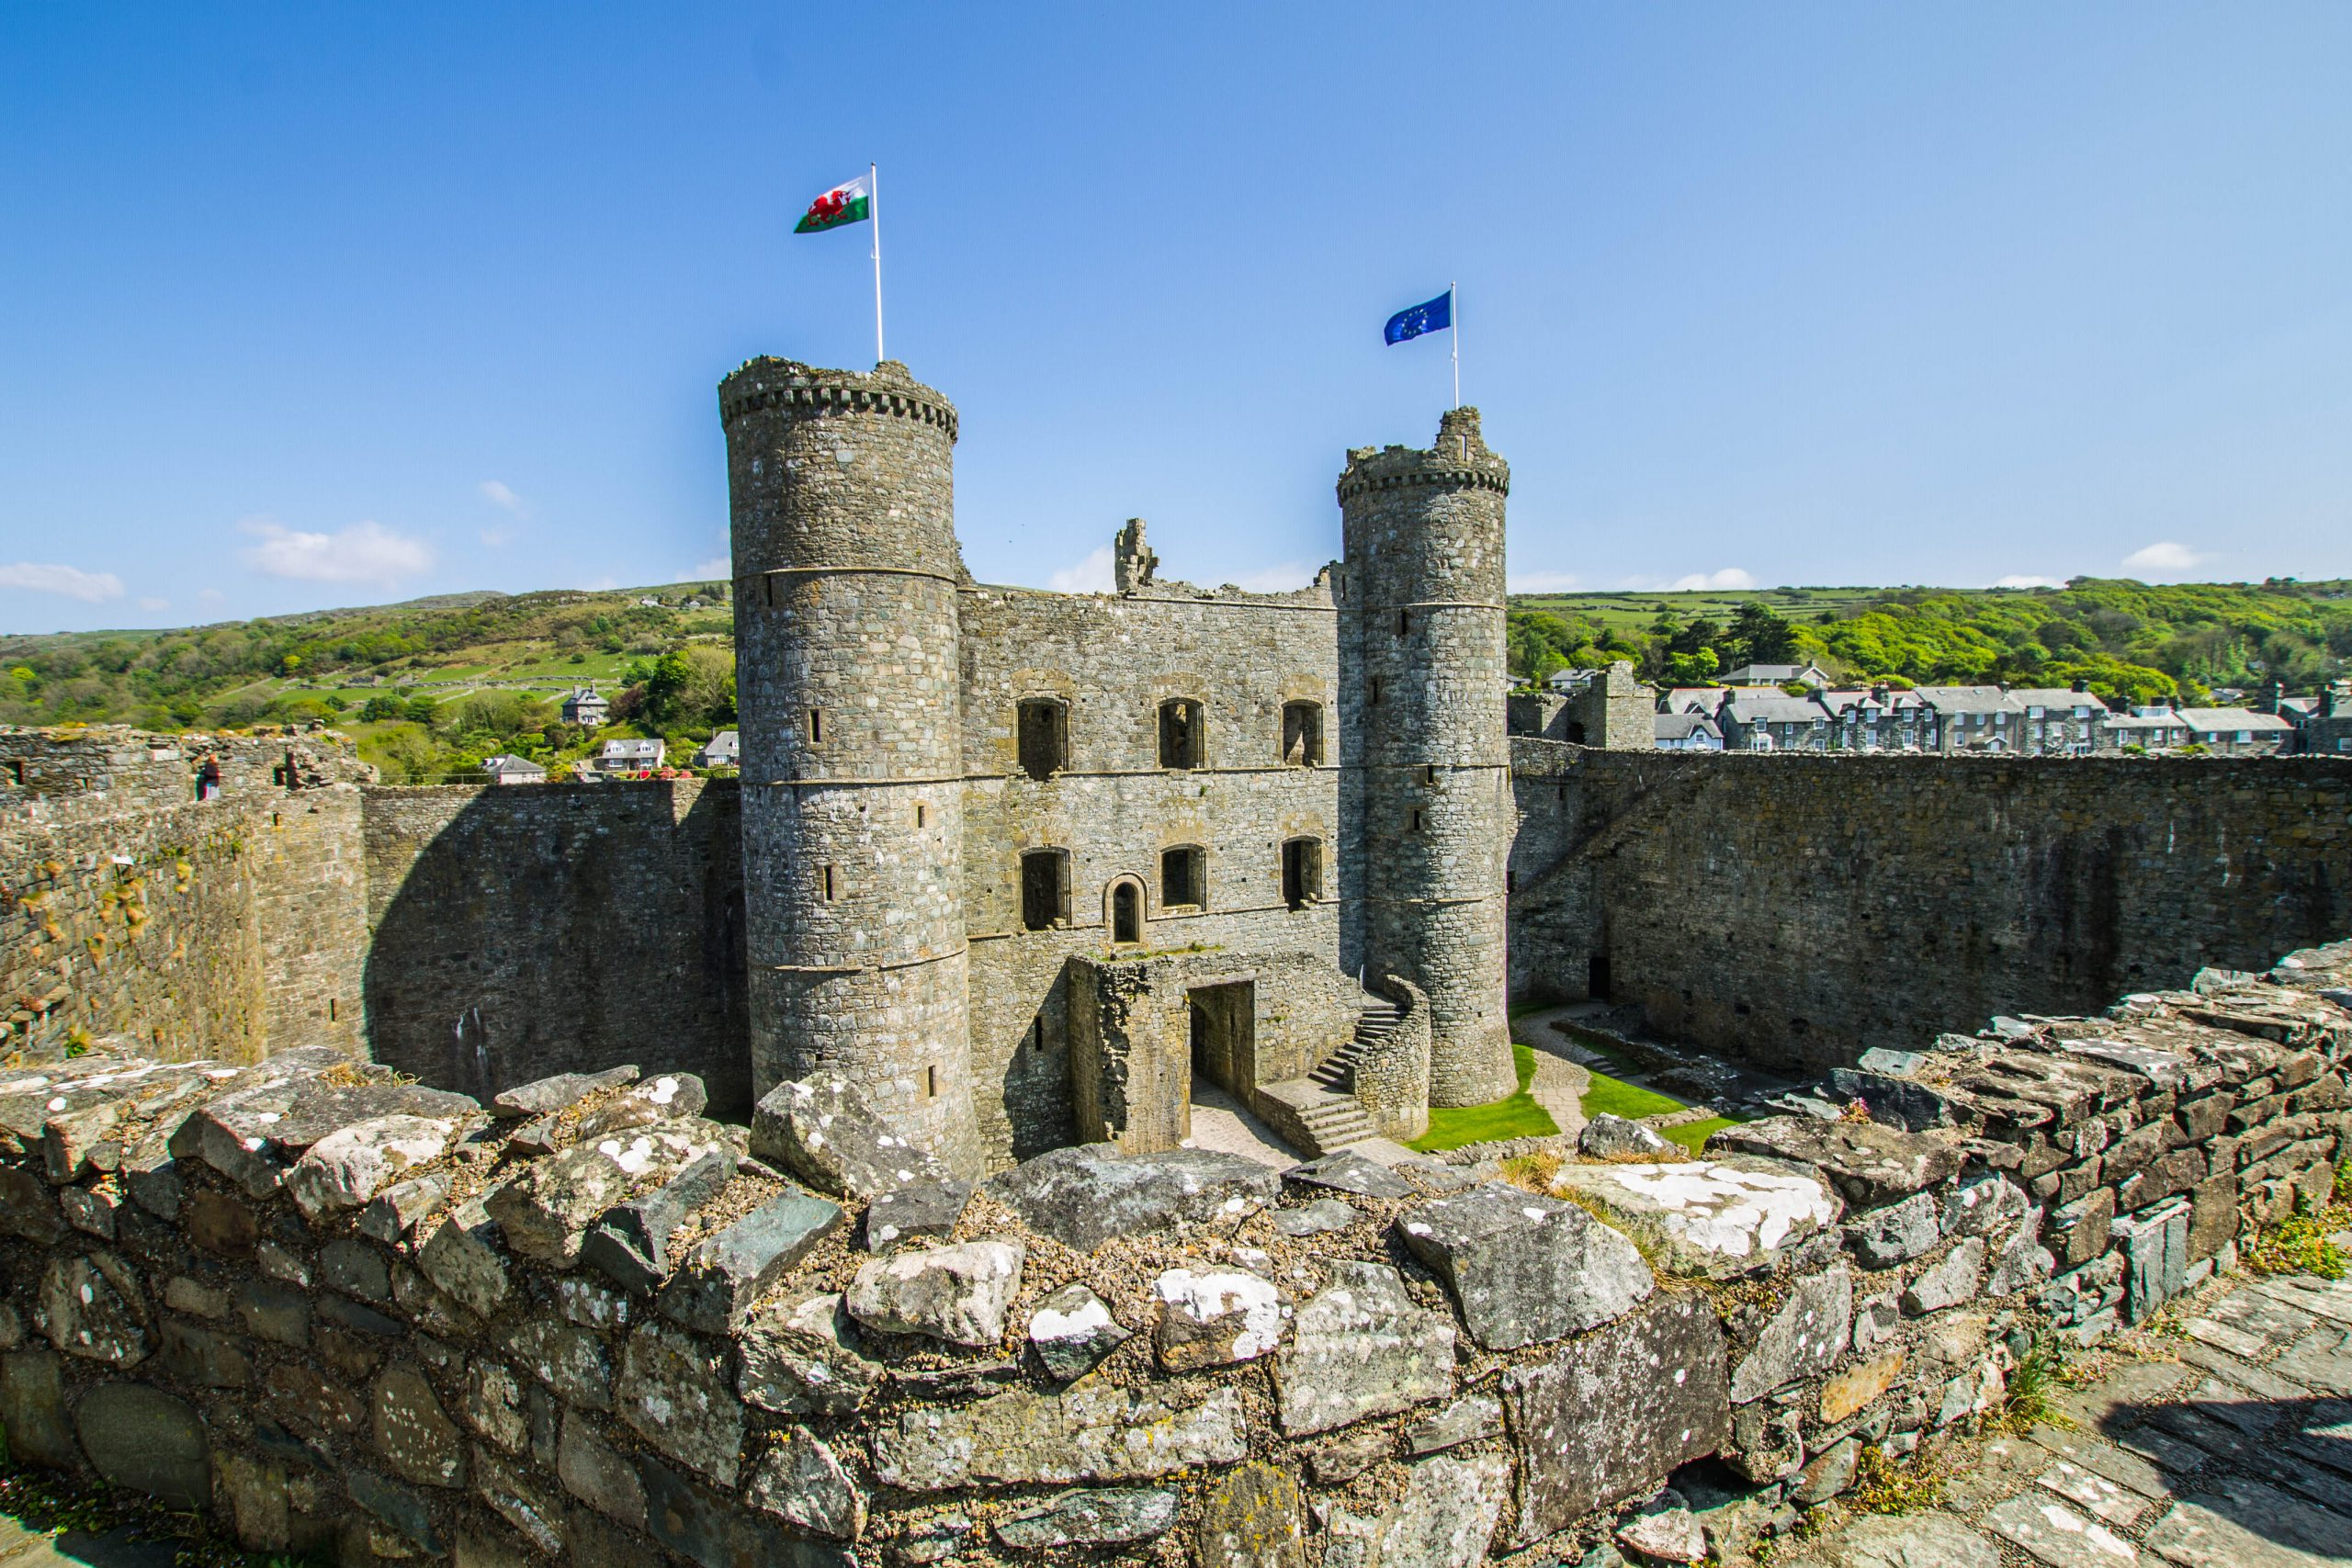 inside Harlech castle from the battlements